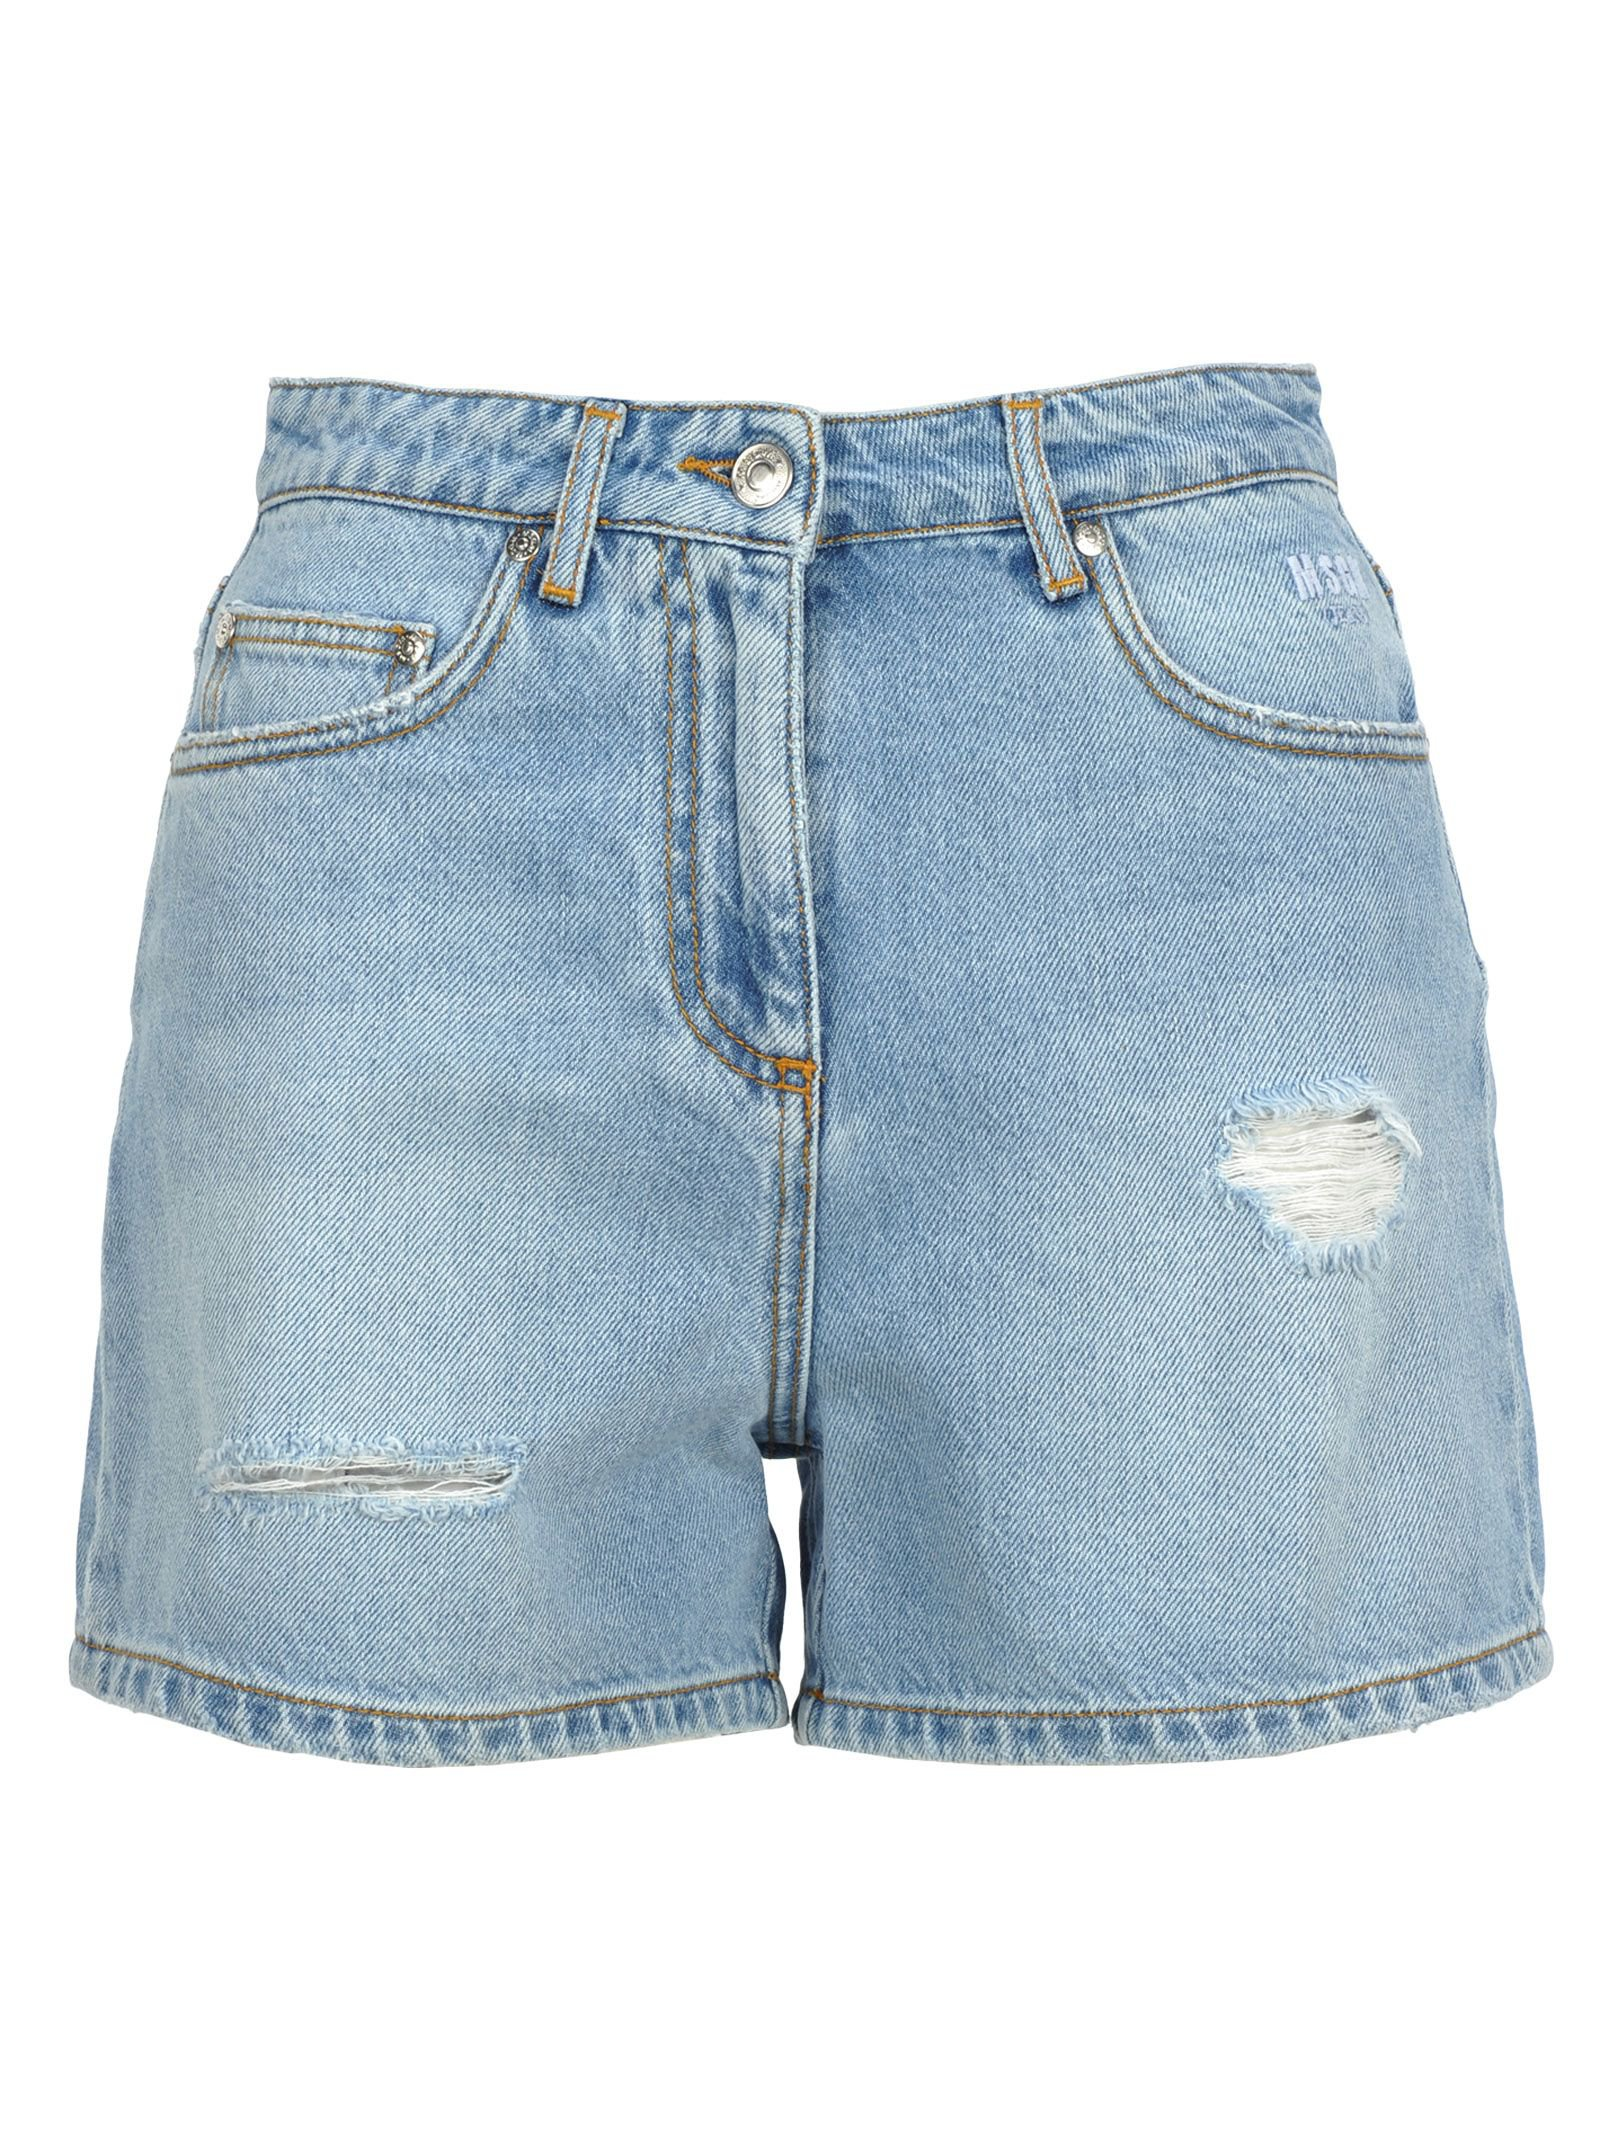 Msgm Msgm Distressed Denim Shorts